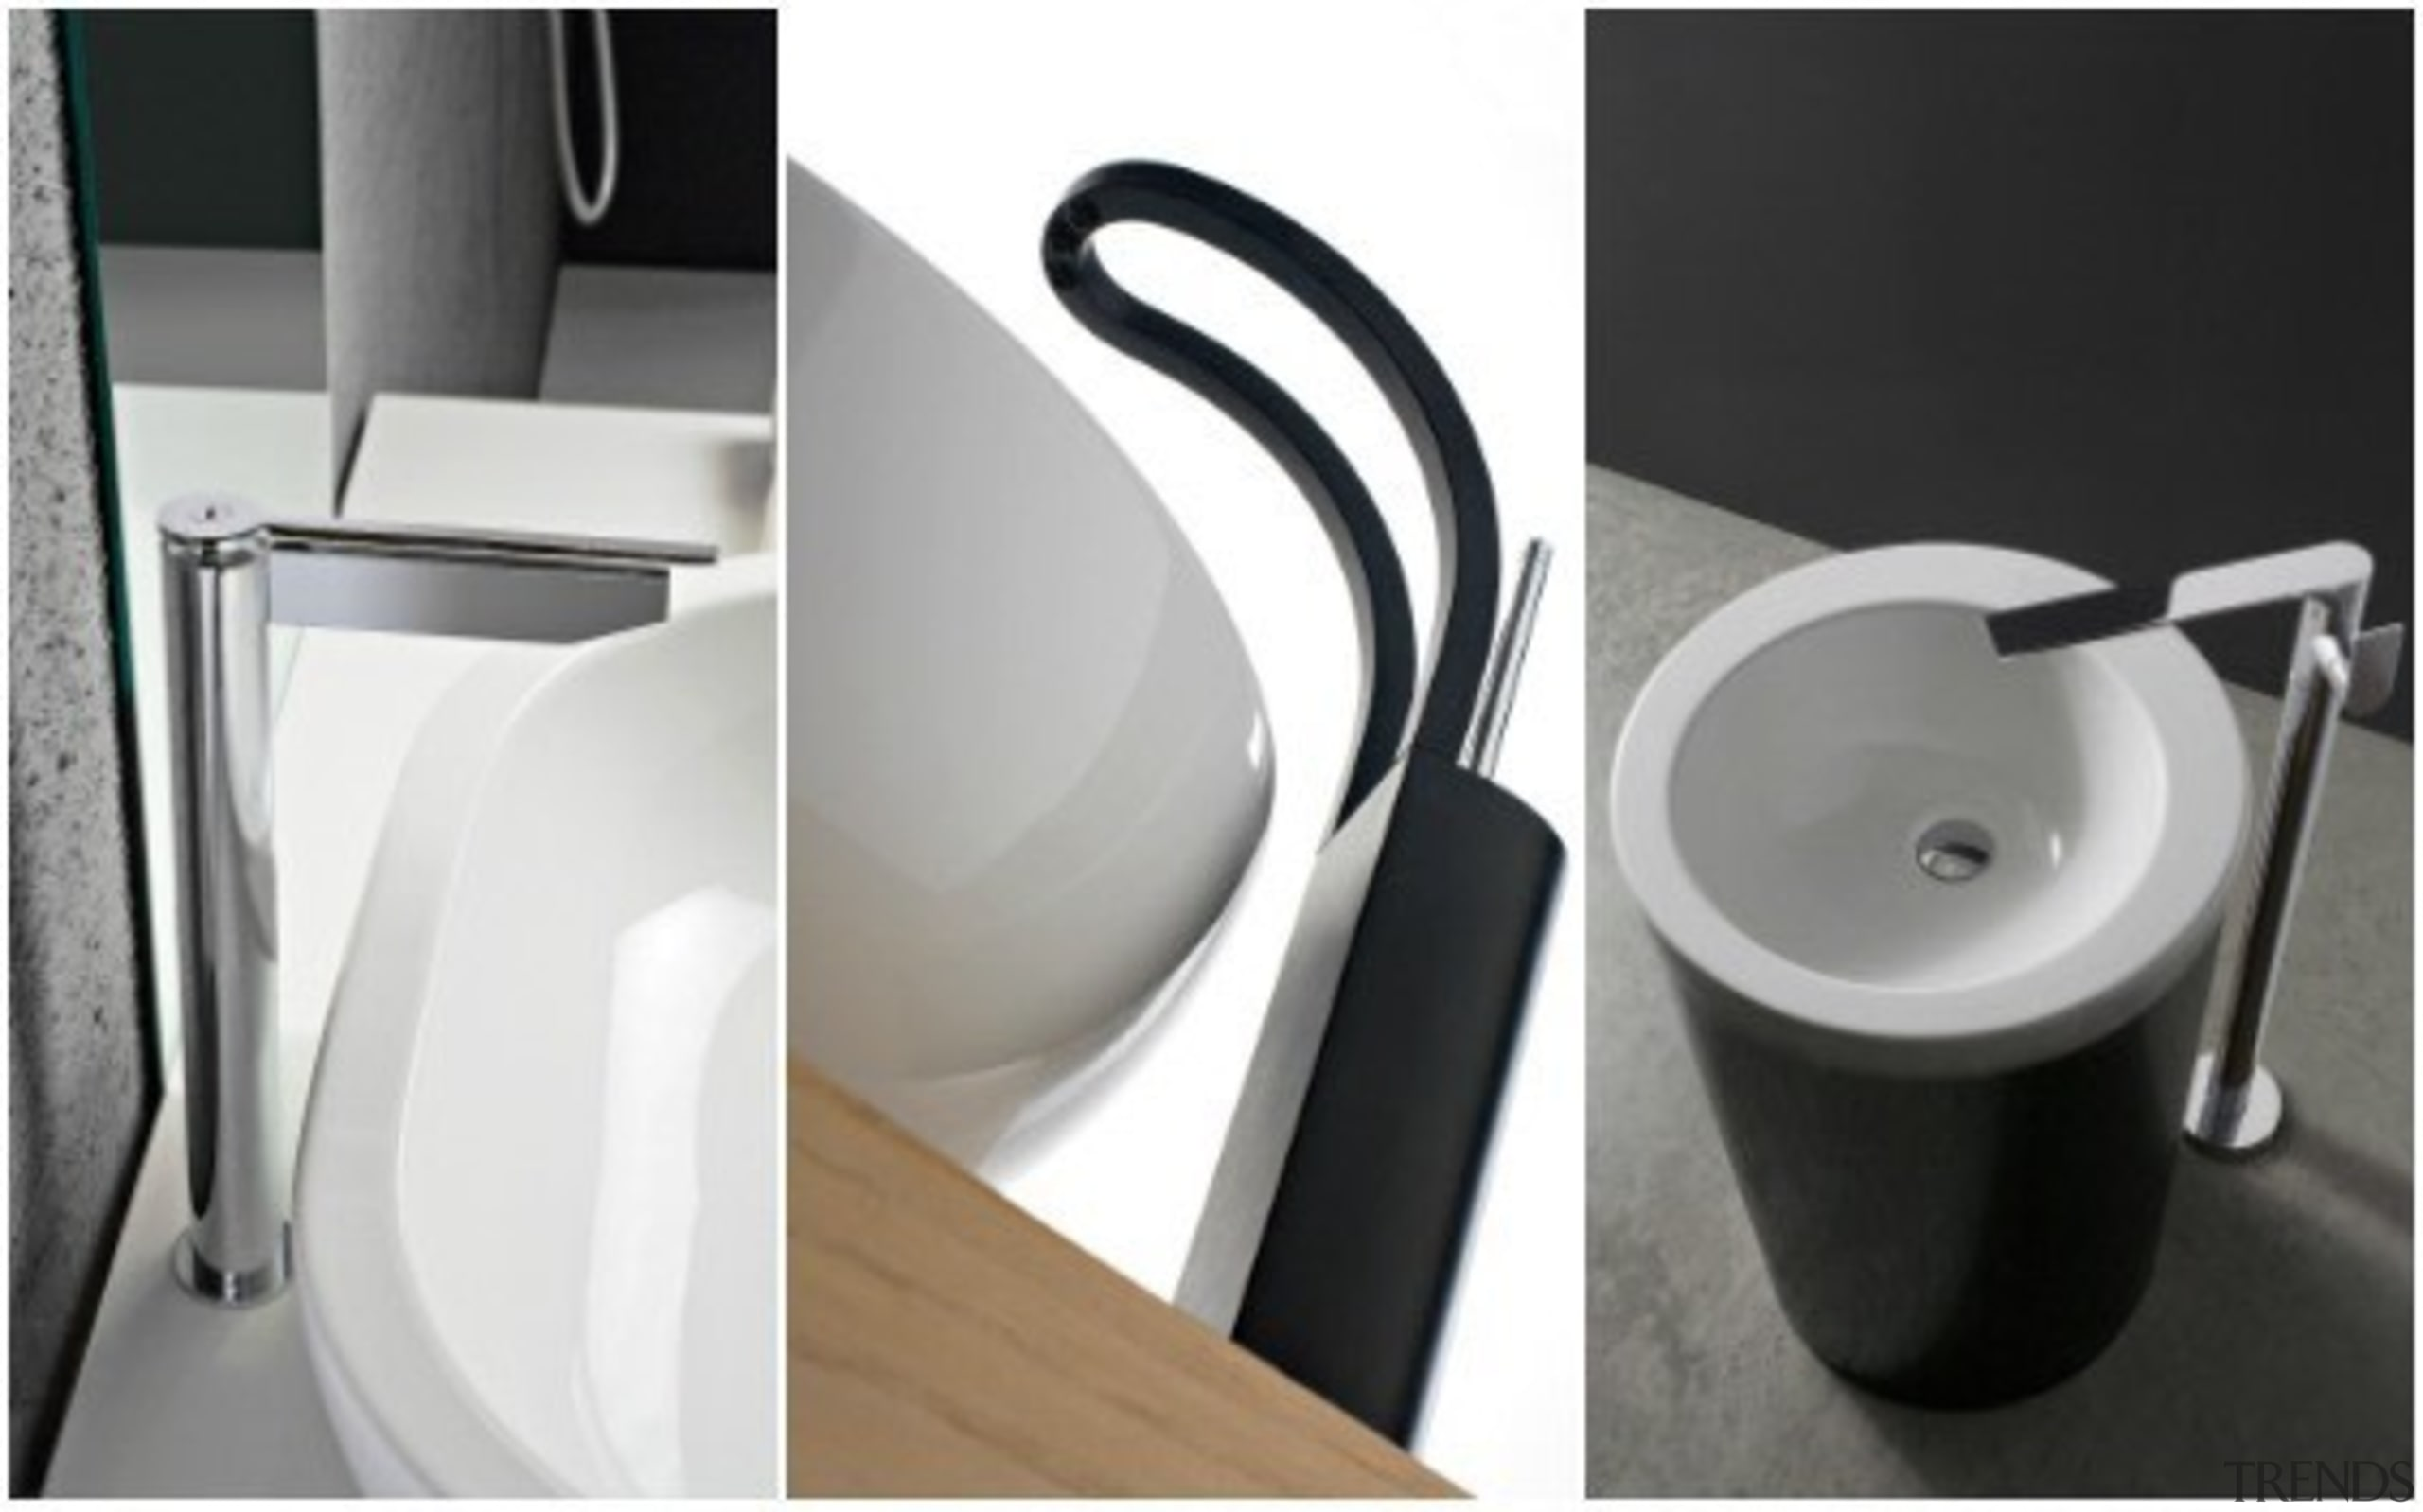 Trenz - bathroom | plumbing fixture | product bathroom, plumbing fixture, product, product design, sink, small appliance, tap, toilet seat, white, black